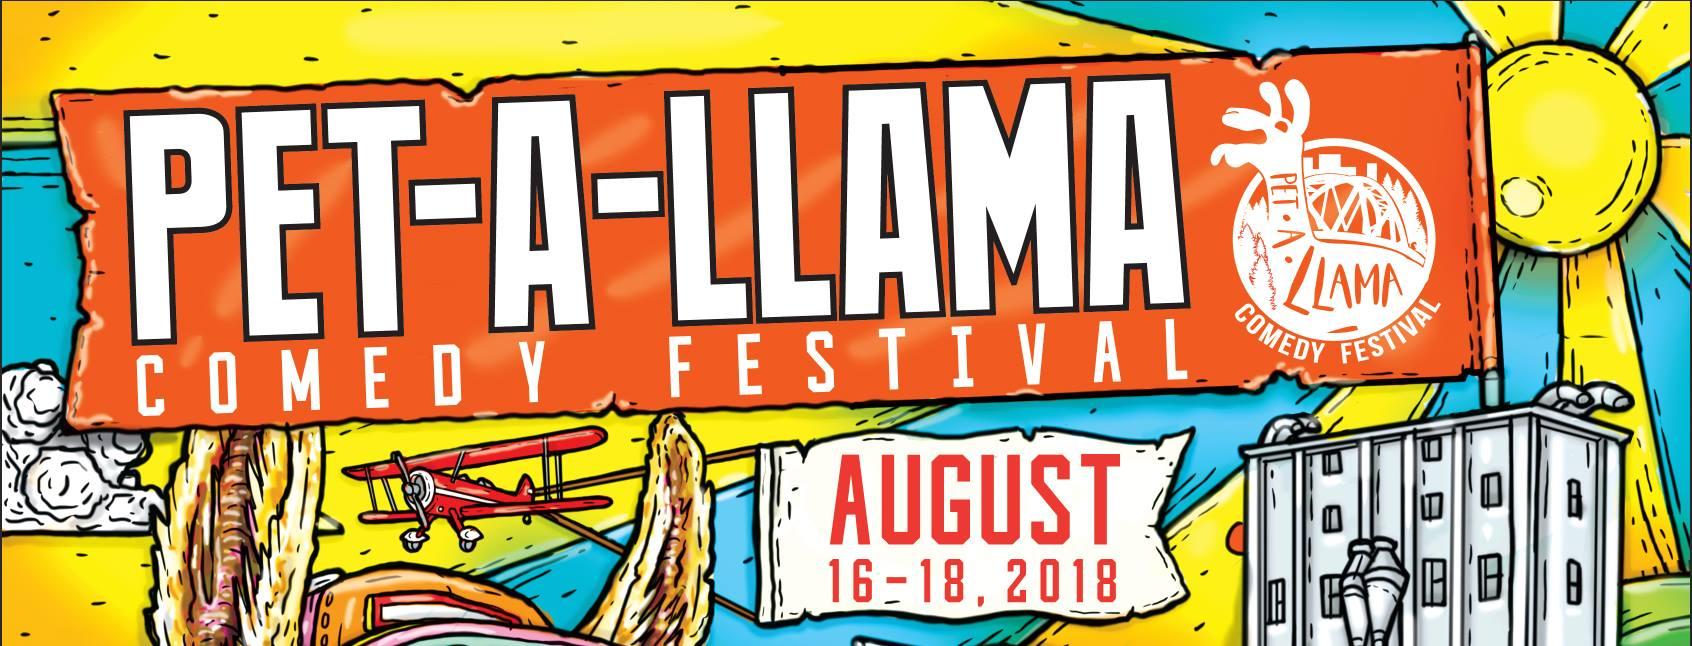 Pet-A-Llama Comedy Festival in Petaluma, Sonoma County, California